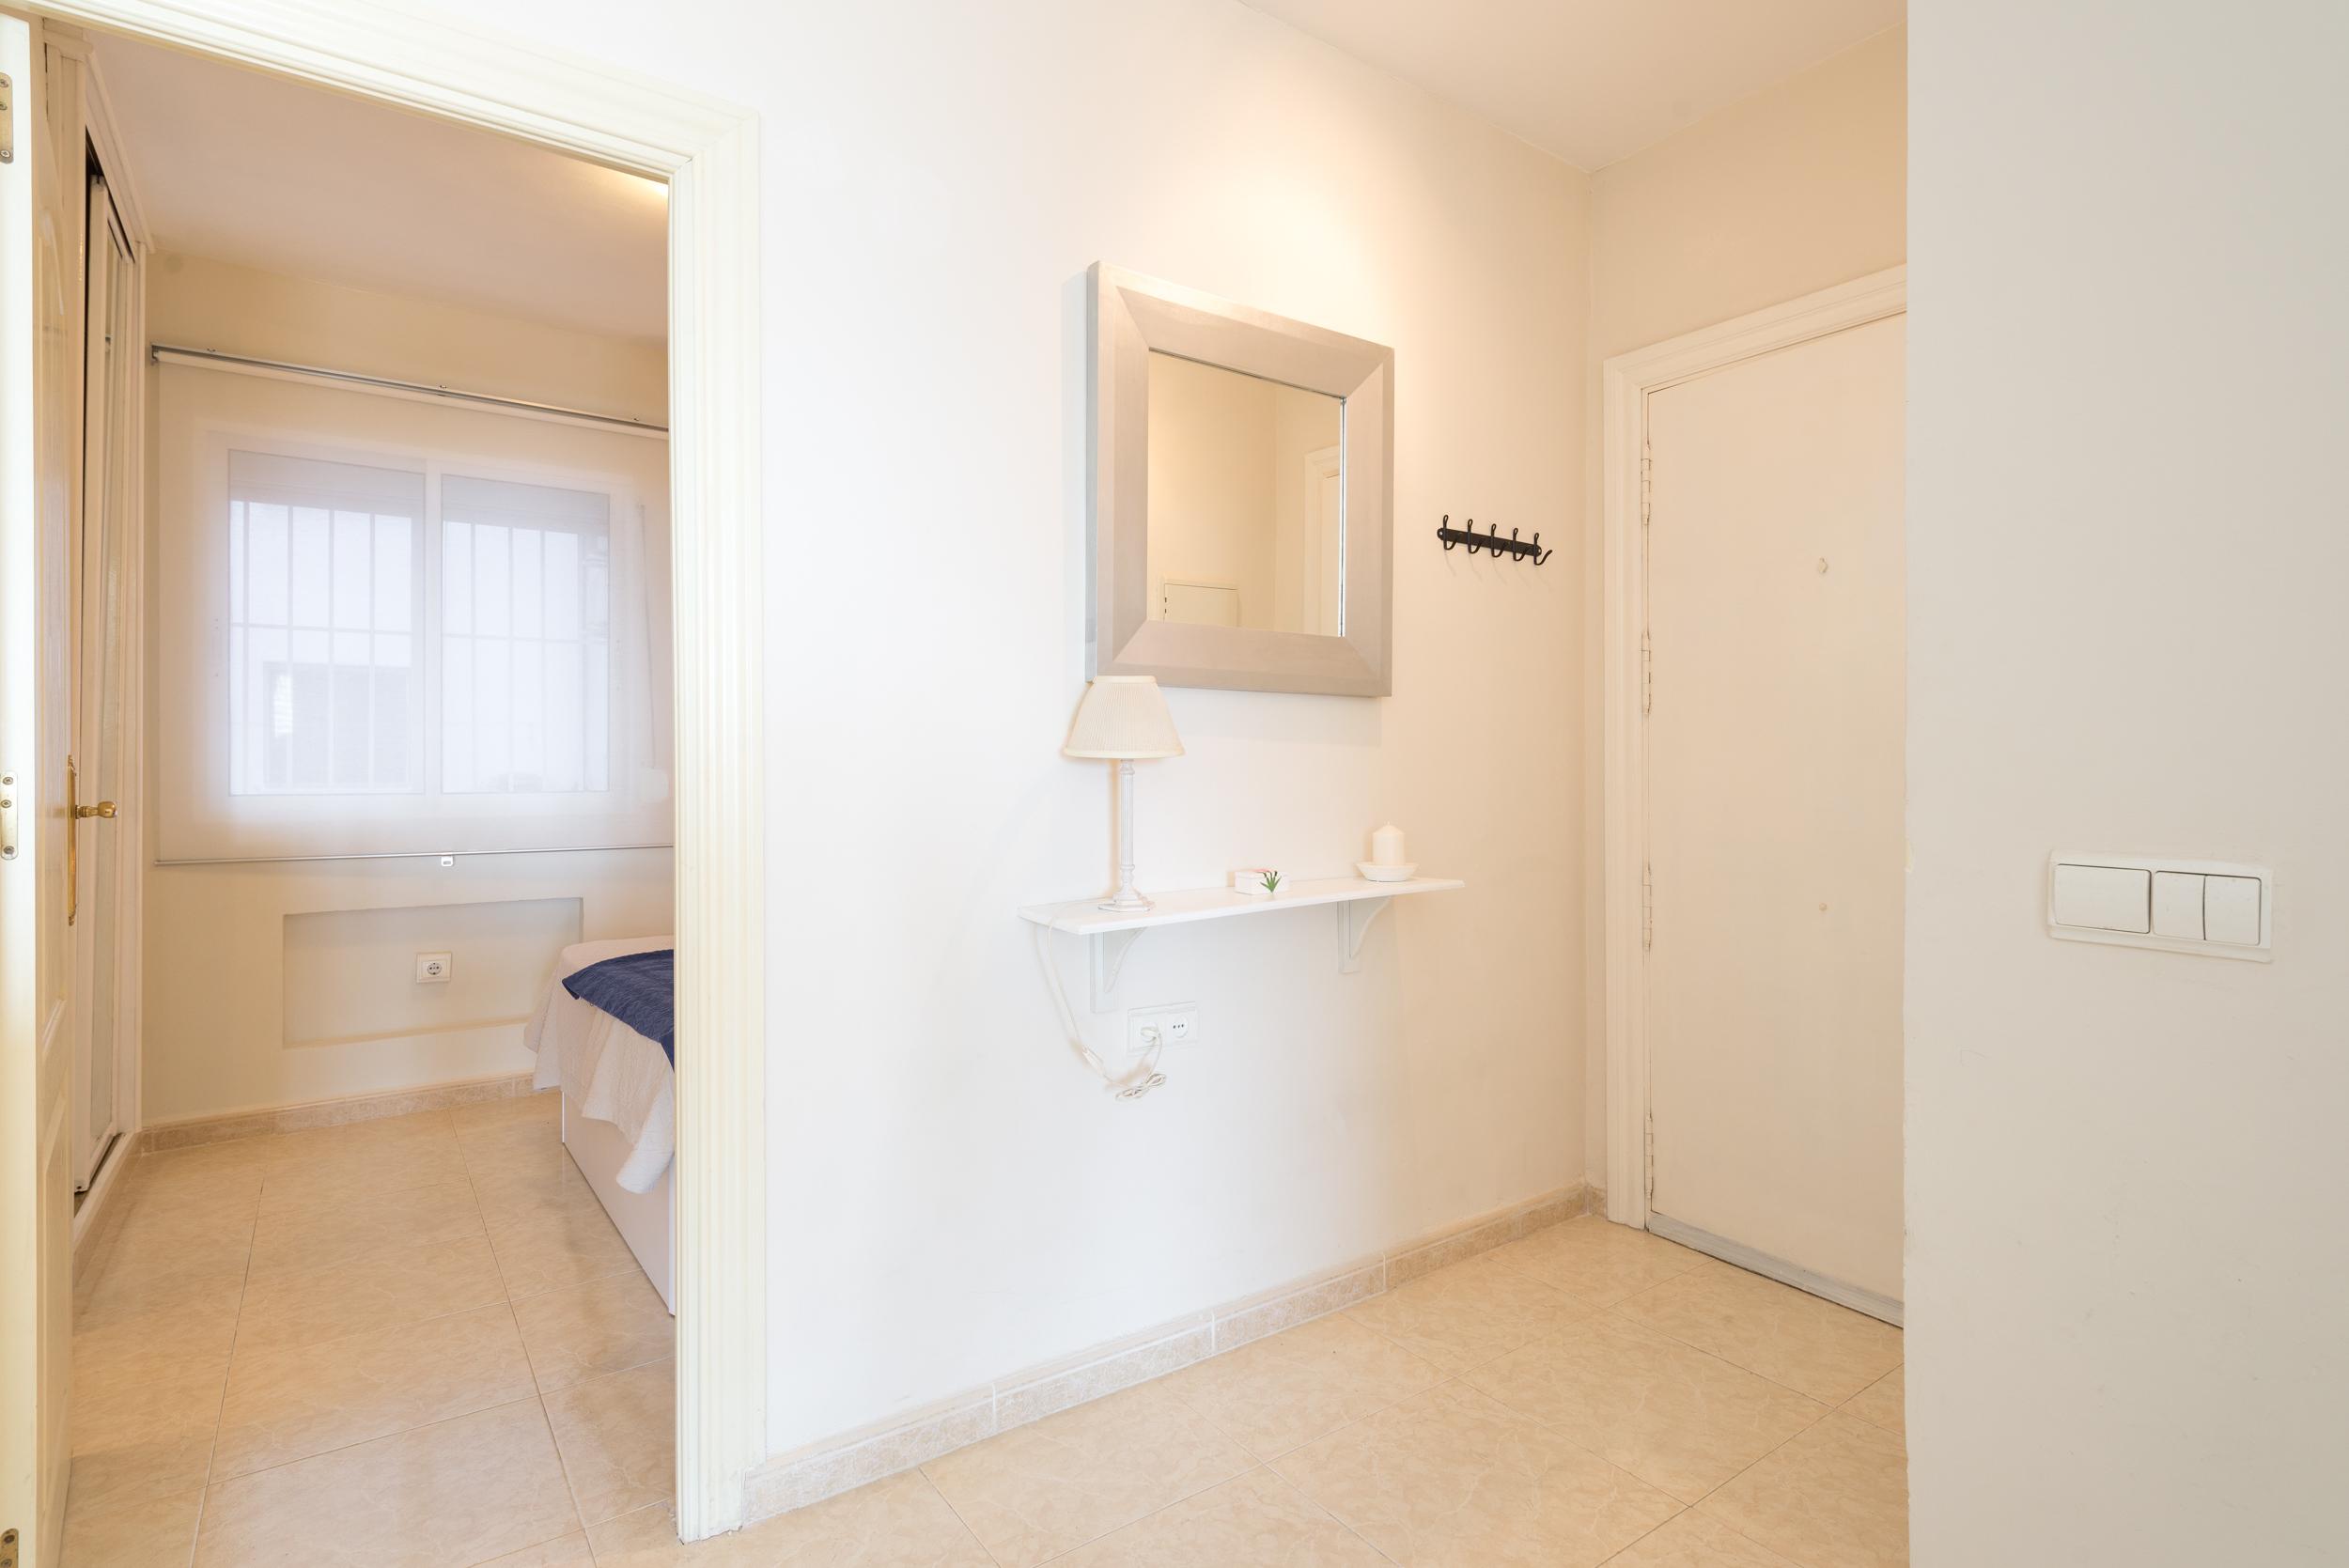 Apartment MalagaSuite Front Beach Malagueta photo 19826896